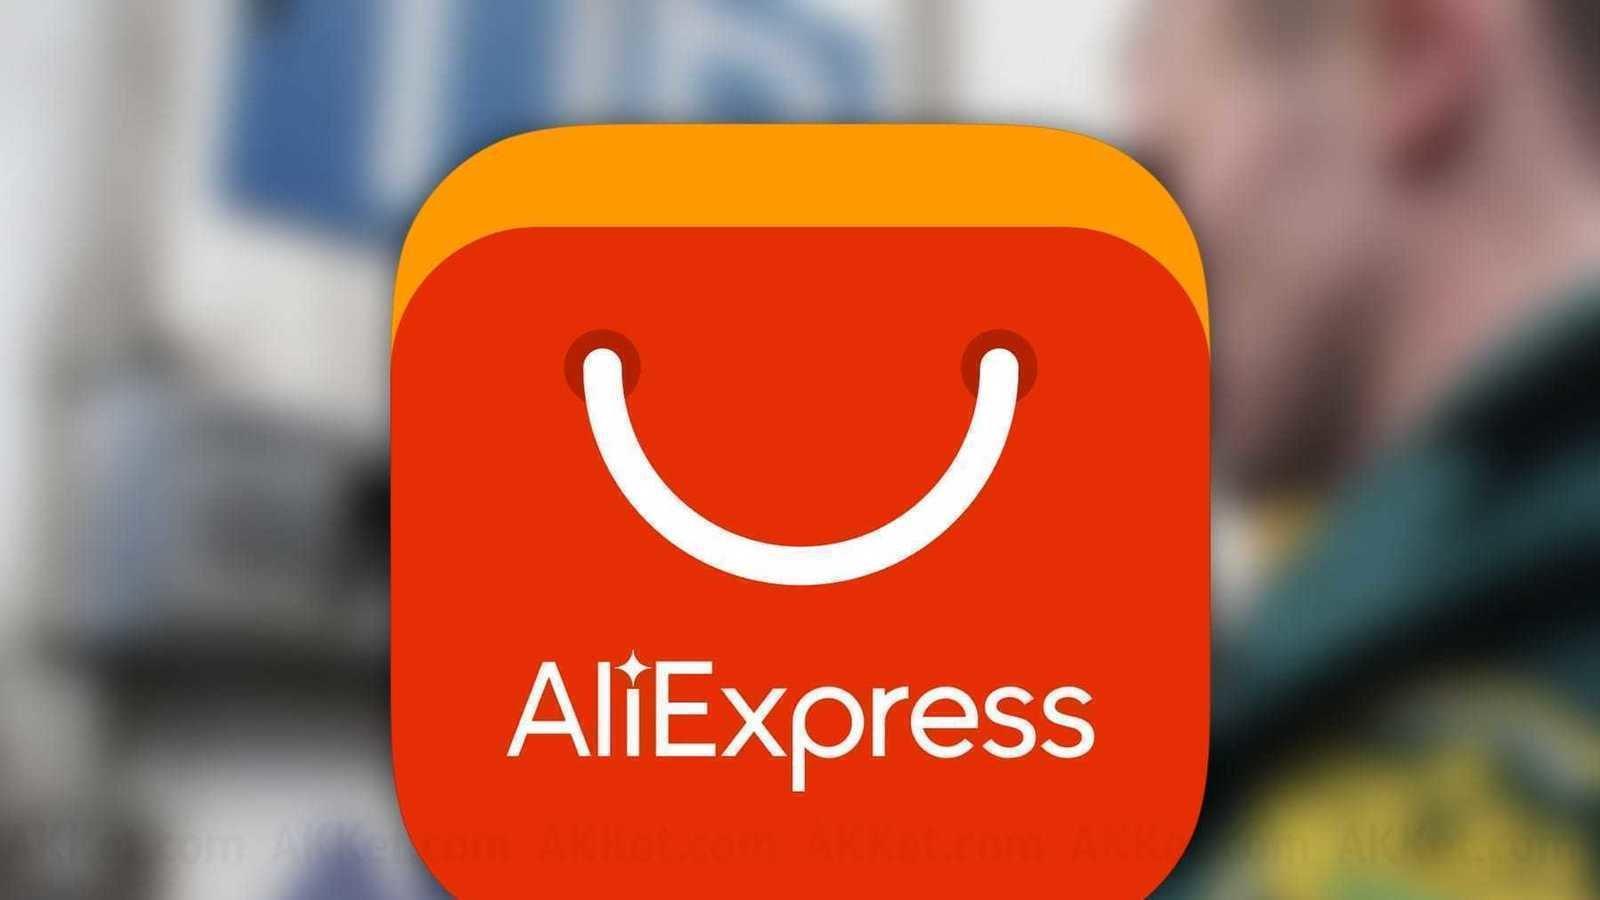 Vender en AliExpress - Agencia especializada en AliExpress